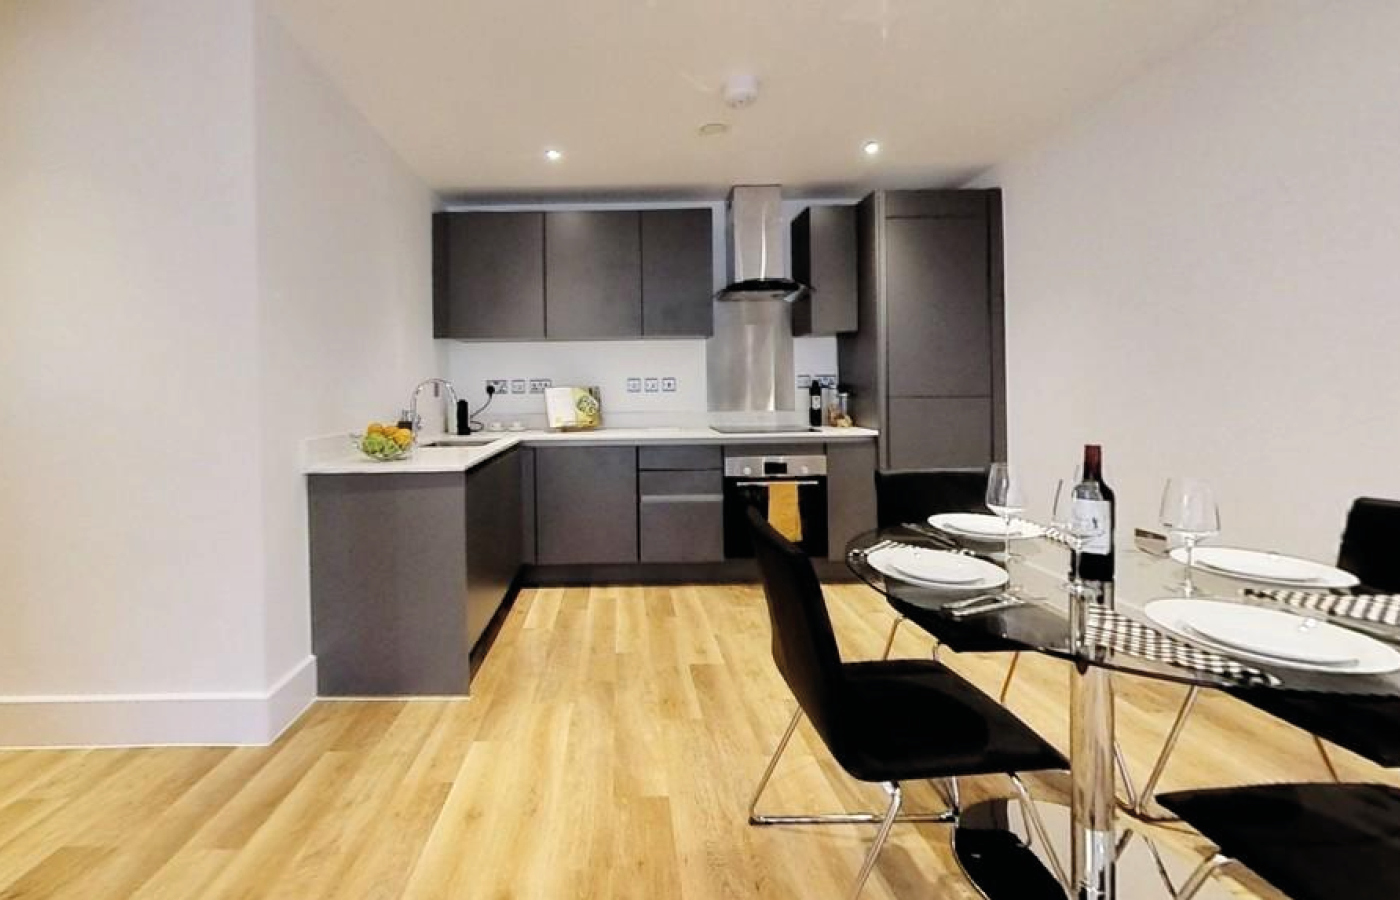 luxury apartment nottingham bridgford place kitchen / diner